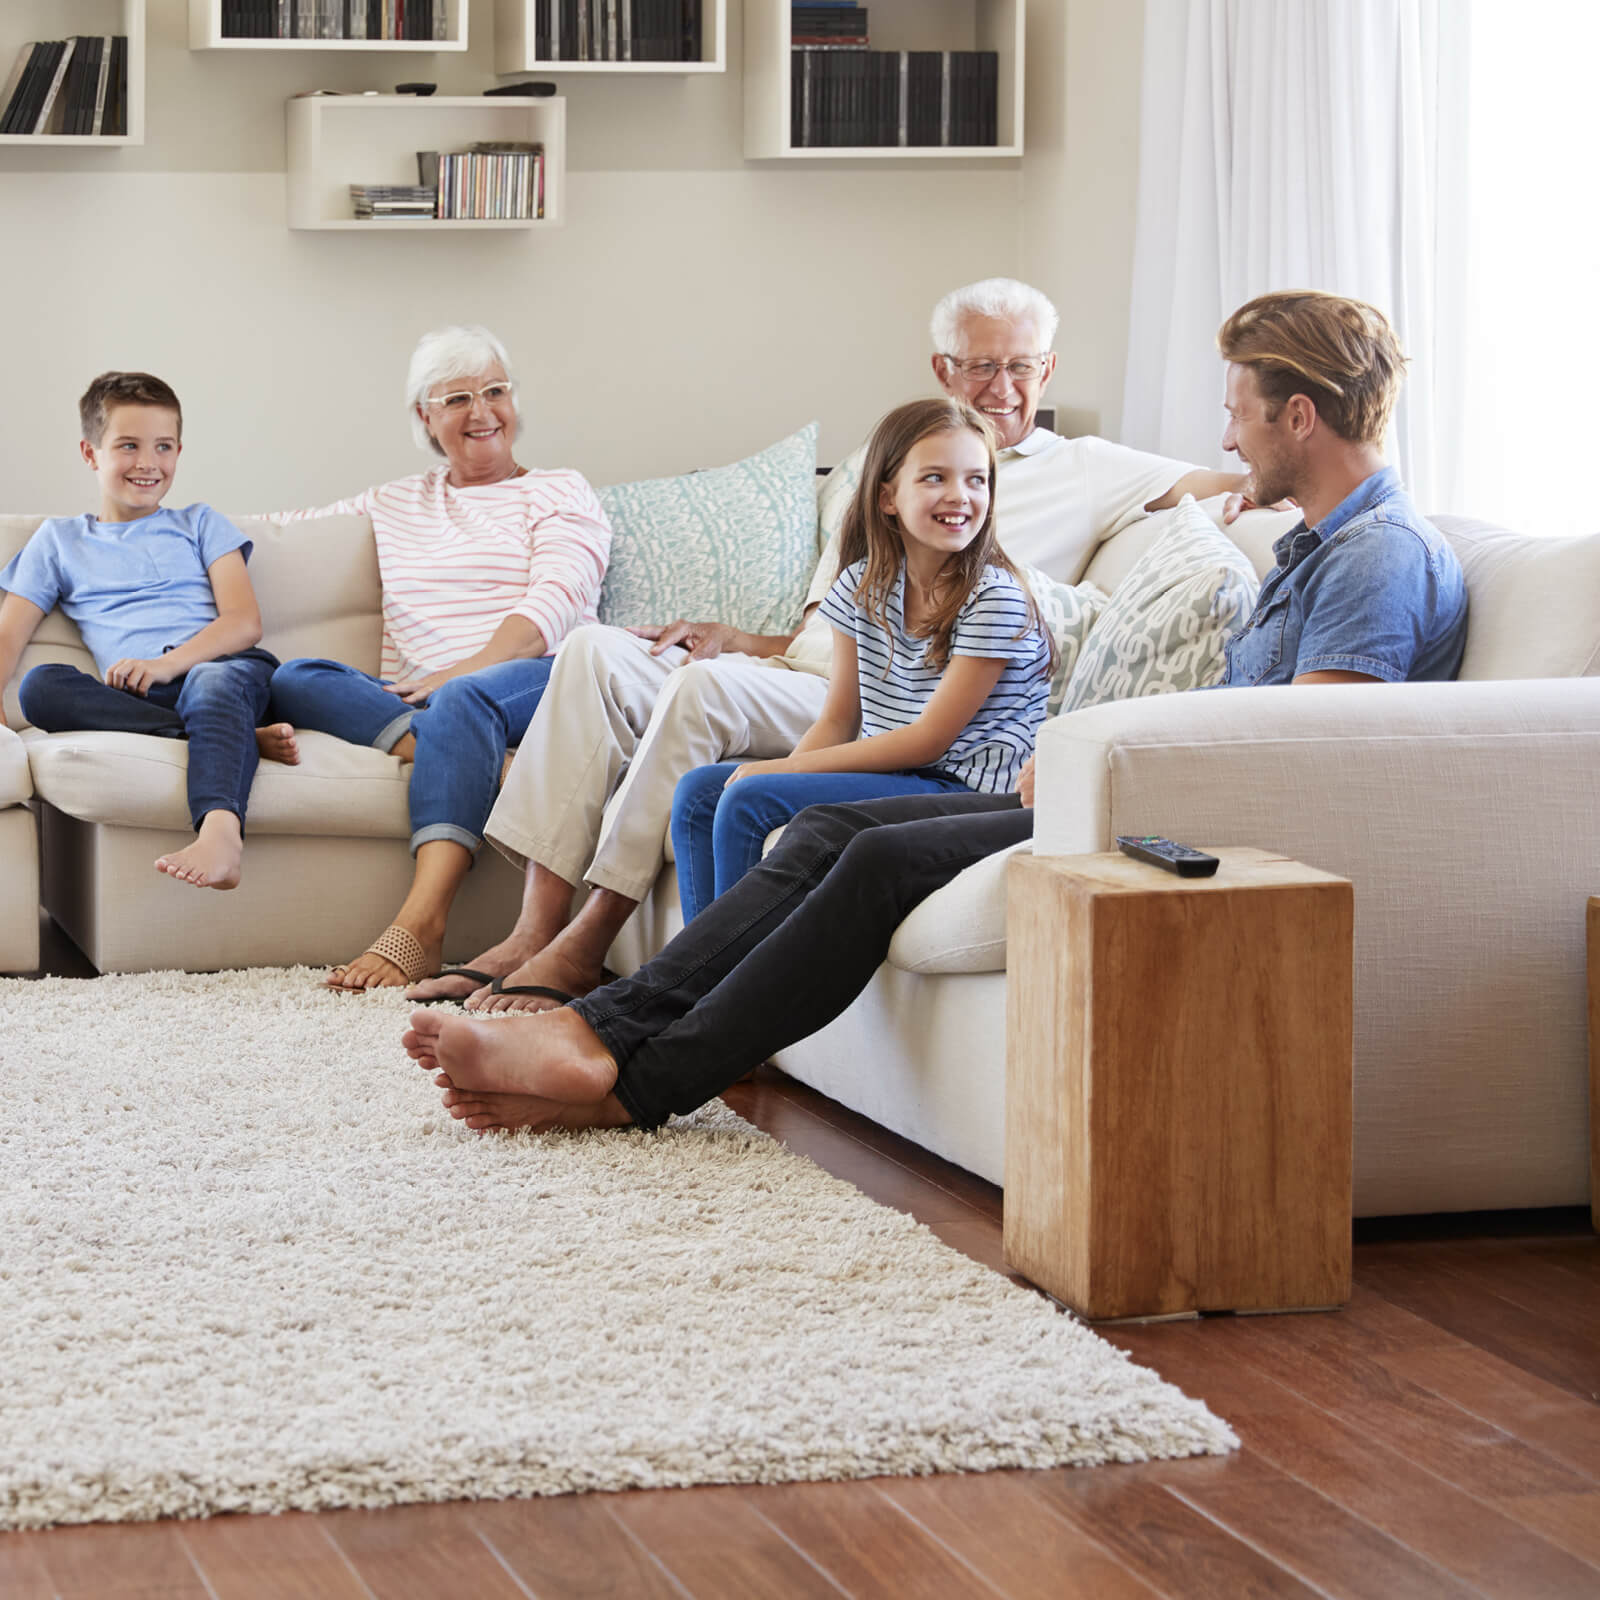 Buy Rugs | Webb Carpet Company